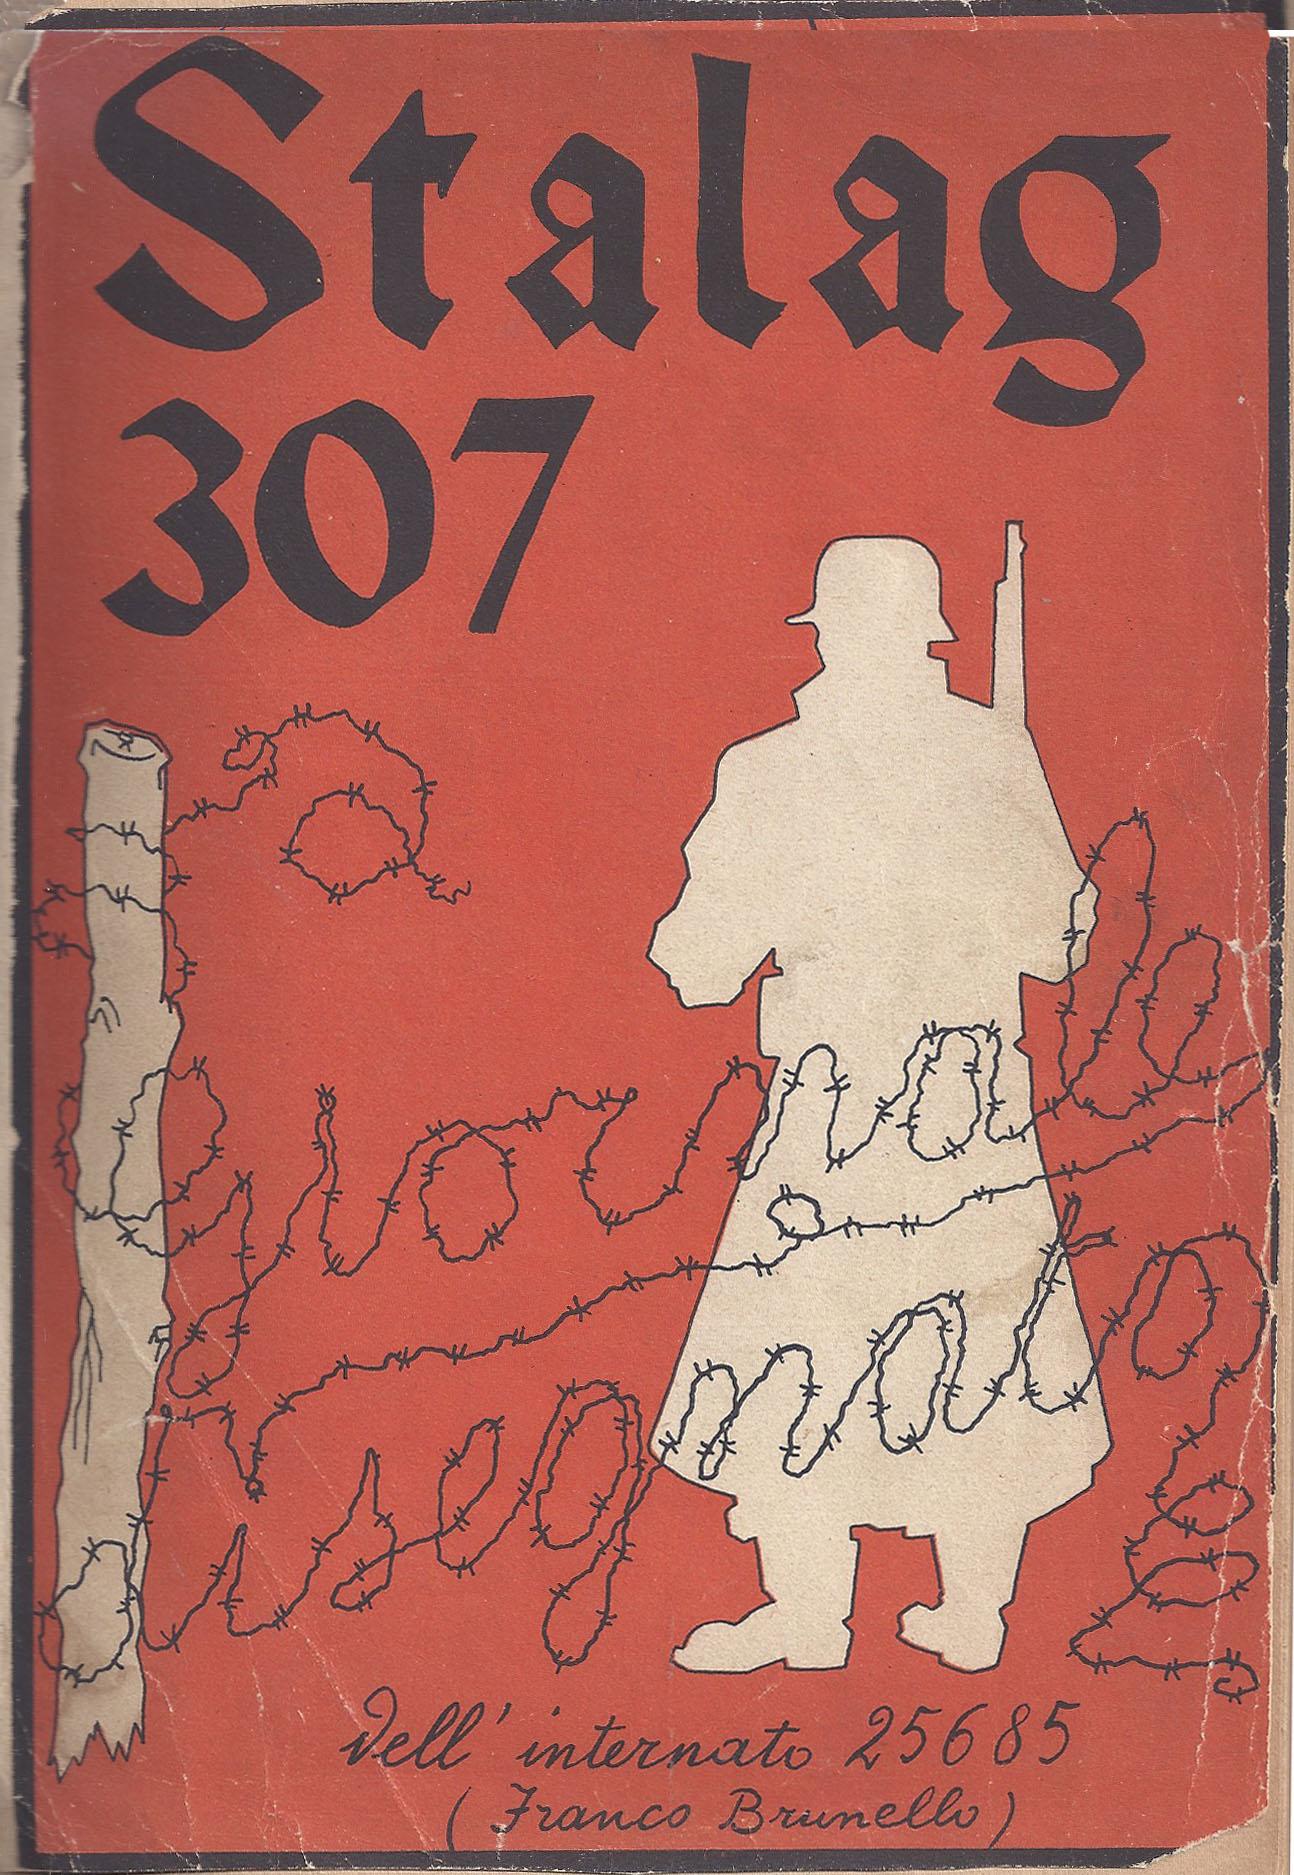 Stalag 307 - la copertina